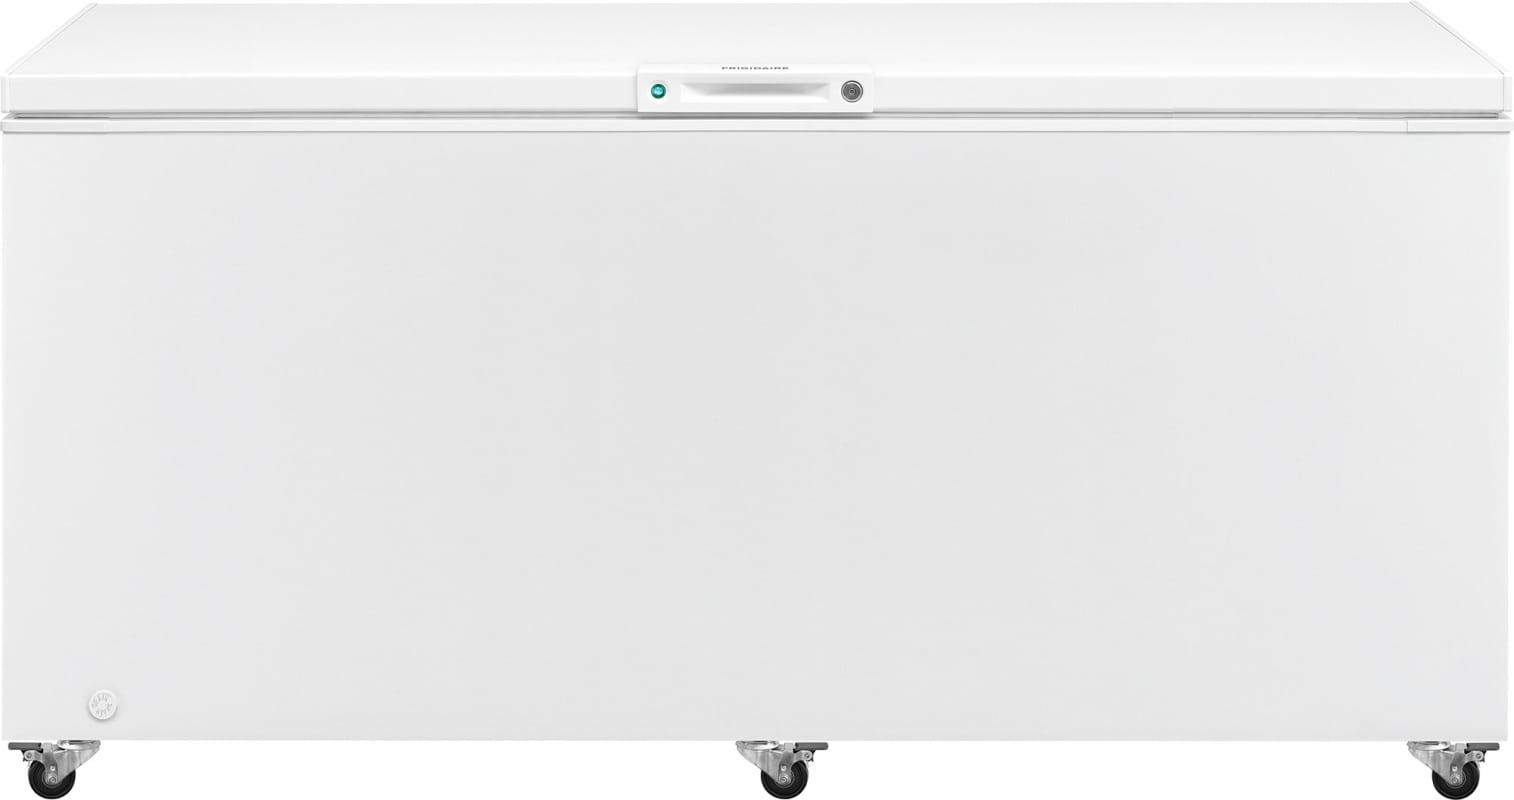 Frigidaire FFFC25M4T 83 Inch Wide 24.8 Cu. Ft. Chest Freezer with SpaceWise Adju photo